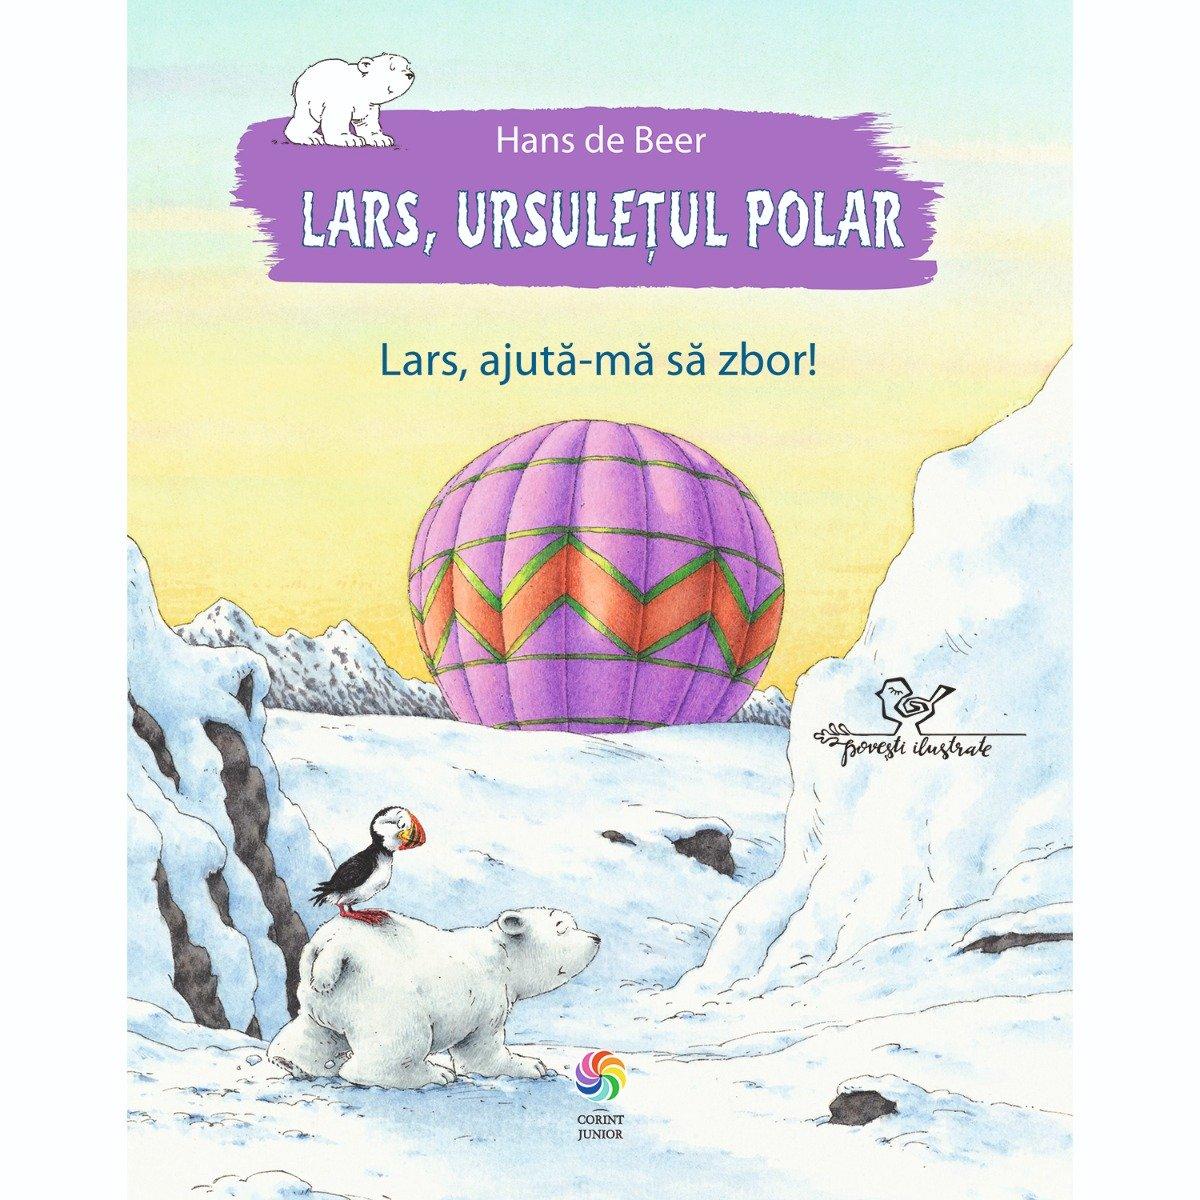 Carte Editura Corint, Lars, ursuletul polar. Lars, ajuta-ma sa zbor !, Hans de Beer